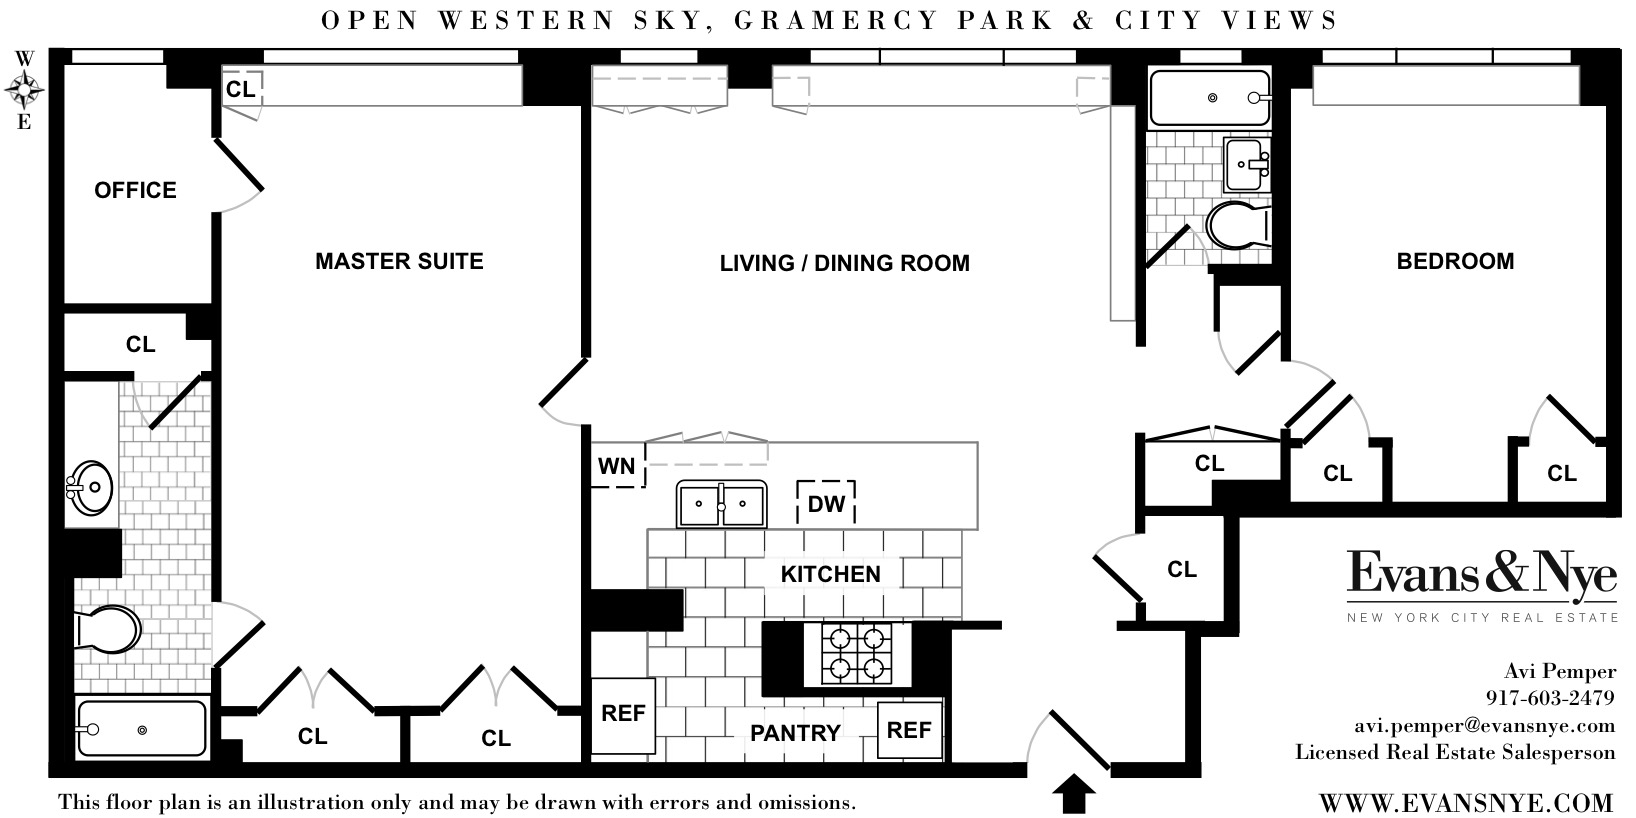 32 Gramercy Park South 16BD